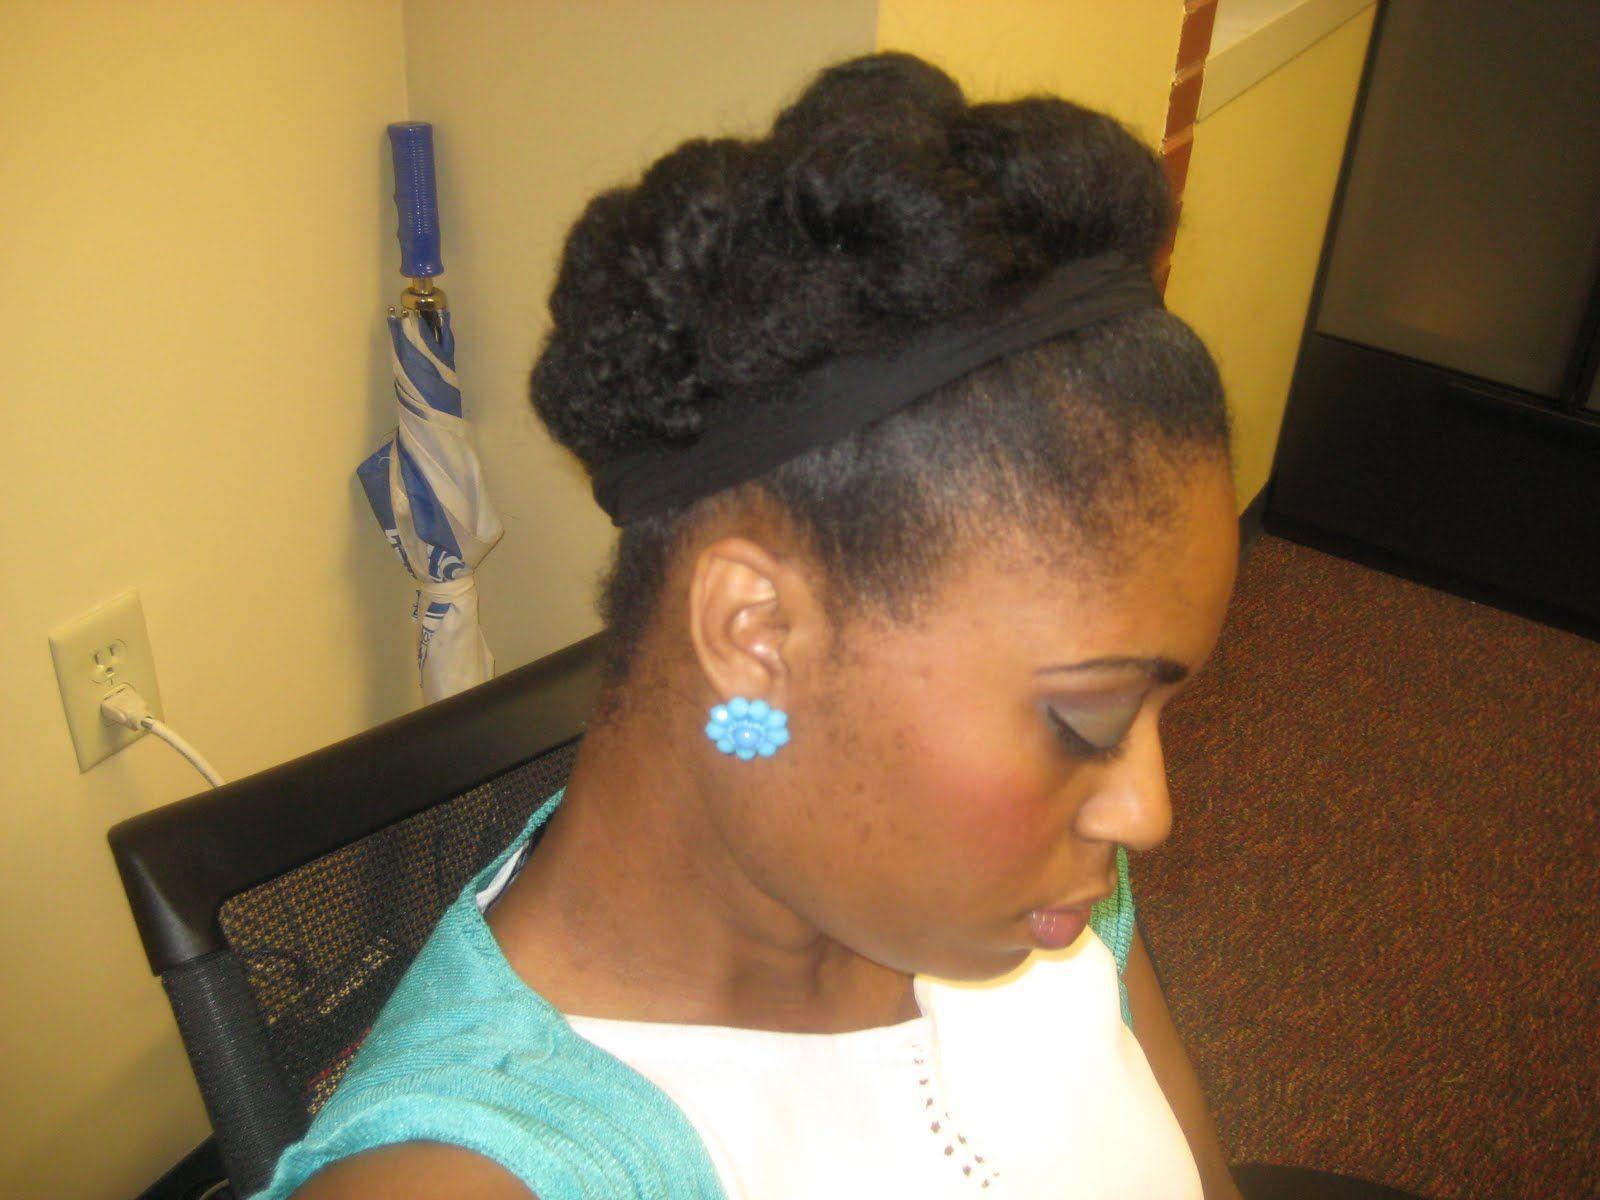 Astounding 1000 Images About Hair Do39S On Pinterest Protective Styles Short Hairstyles For Black Women Fulllsitofus